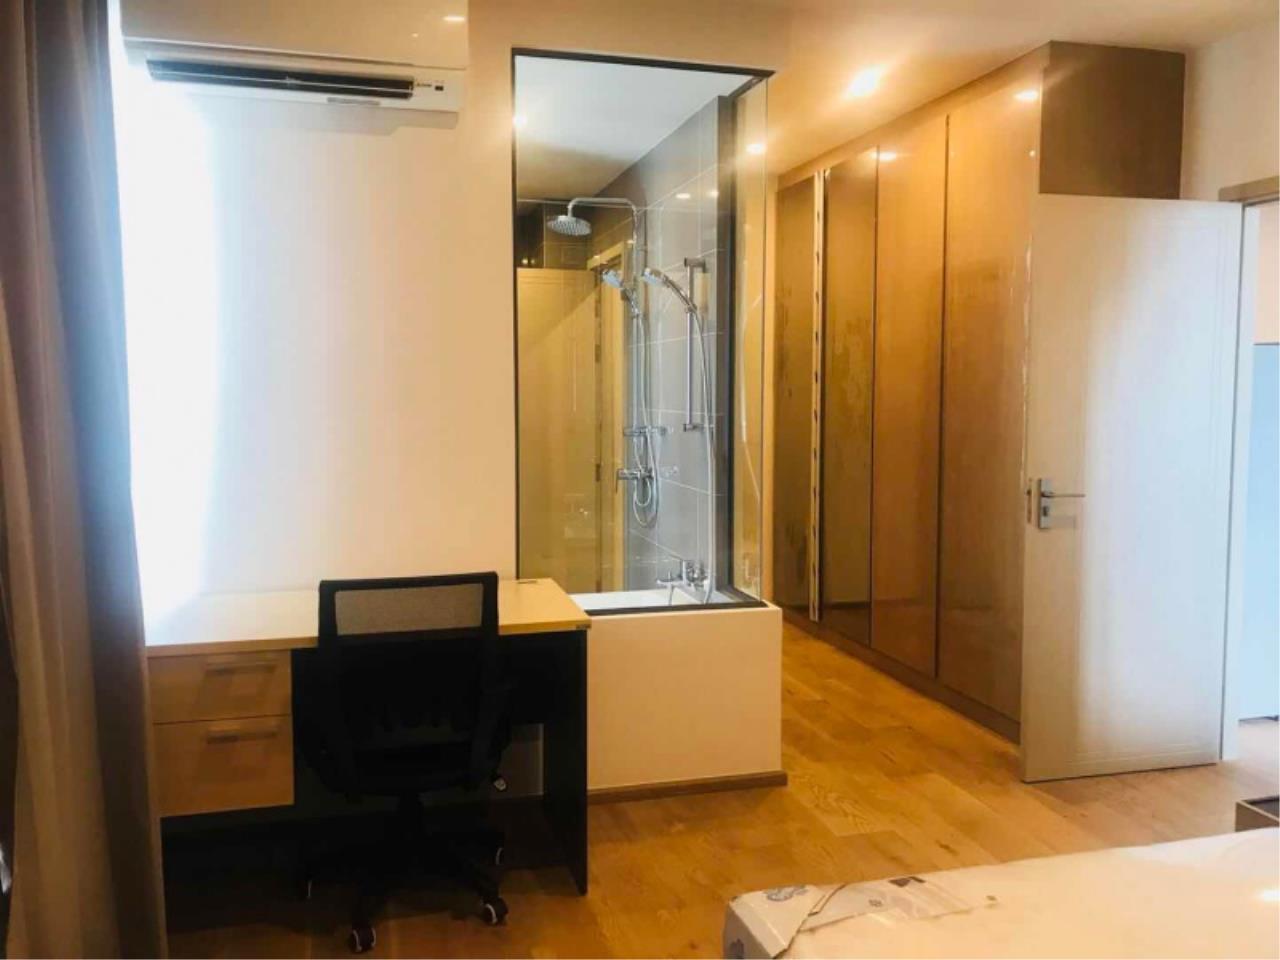 Century21 Skylux Agency's Q Chidlom – Phetchaburi / Condo For Rent / 2 Bedroom / 63 SQM / BTS Chit Lom / Bangkok 5